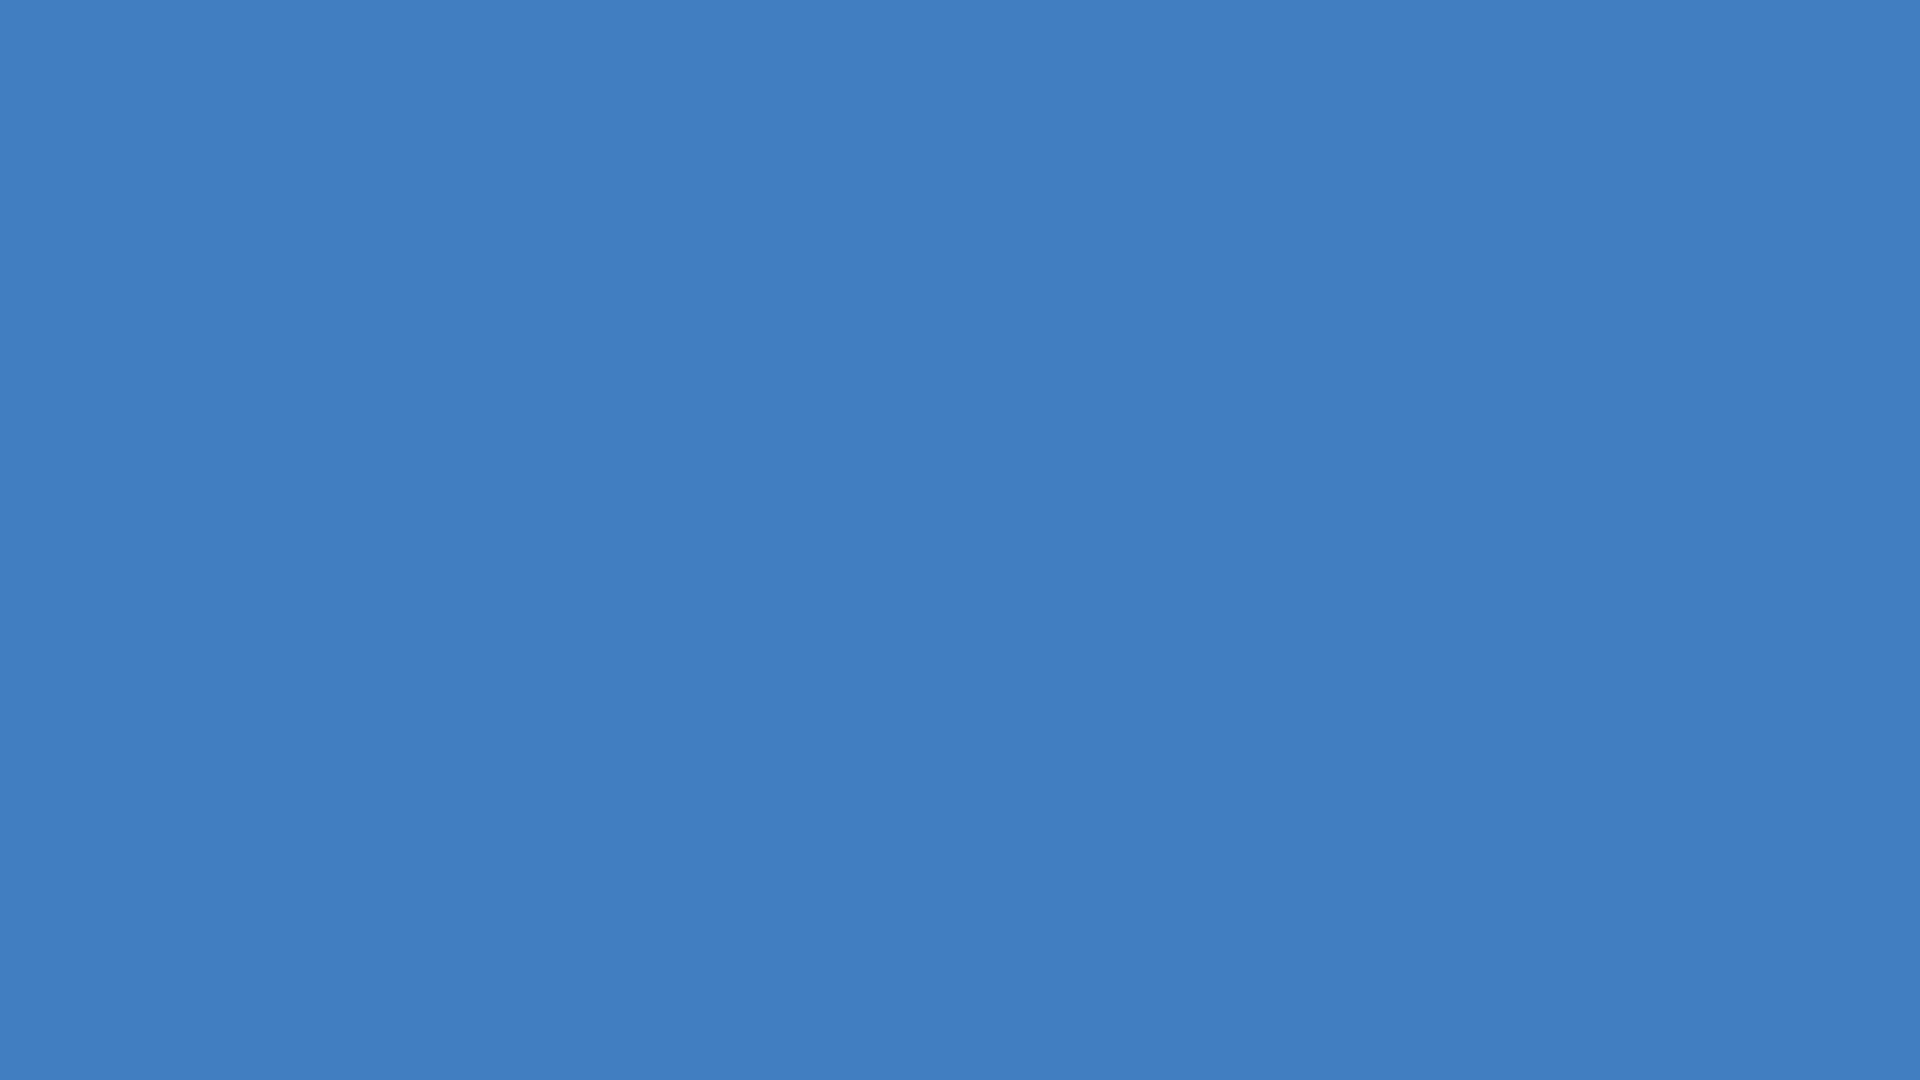 hd solid color wallpaper (81+ images)